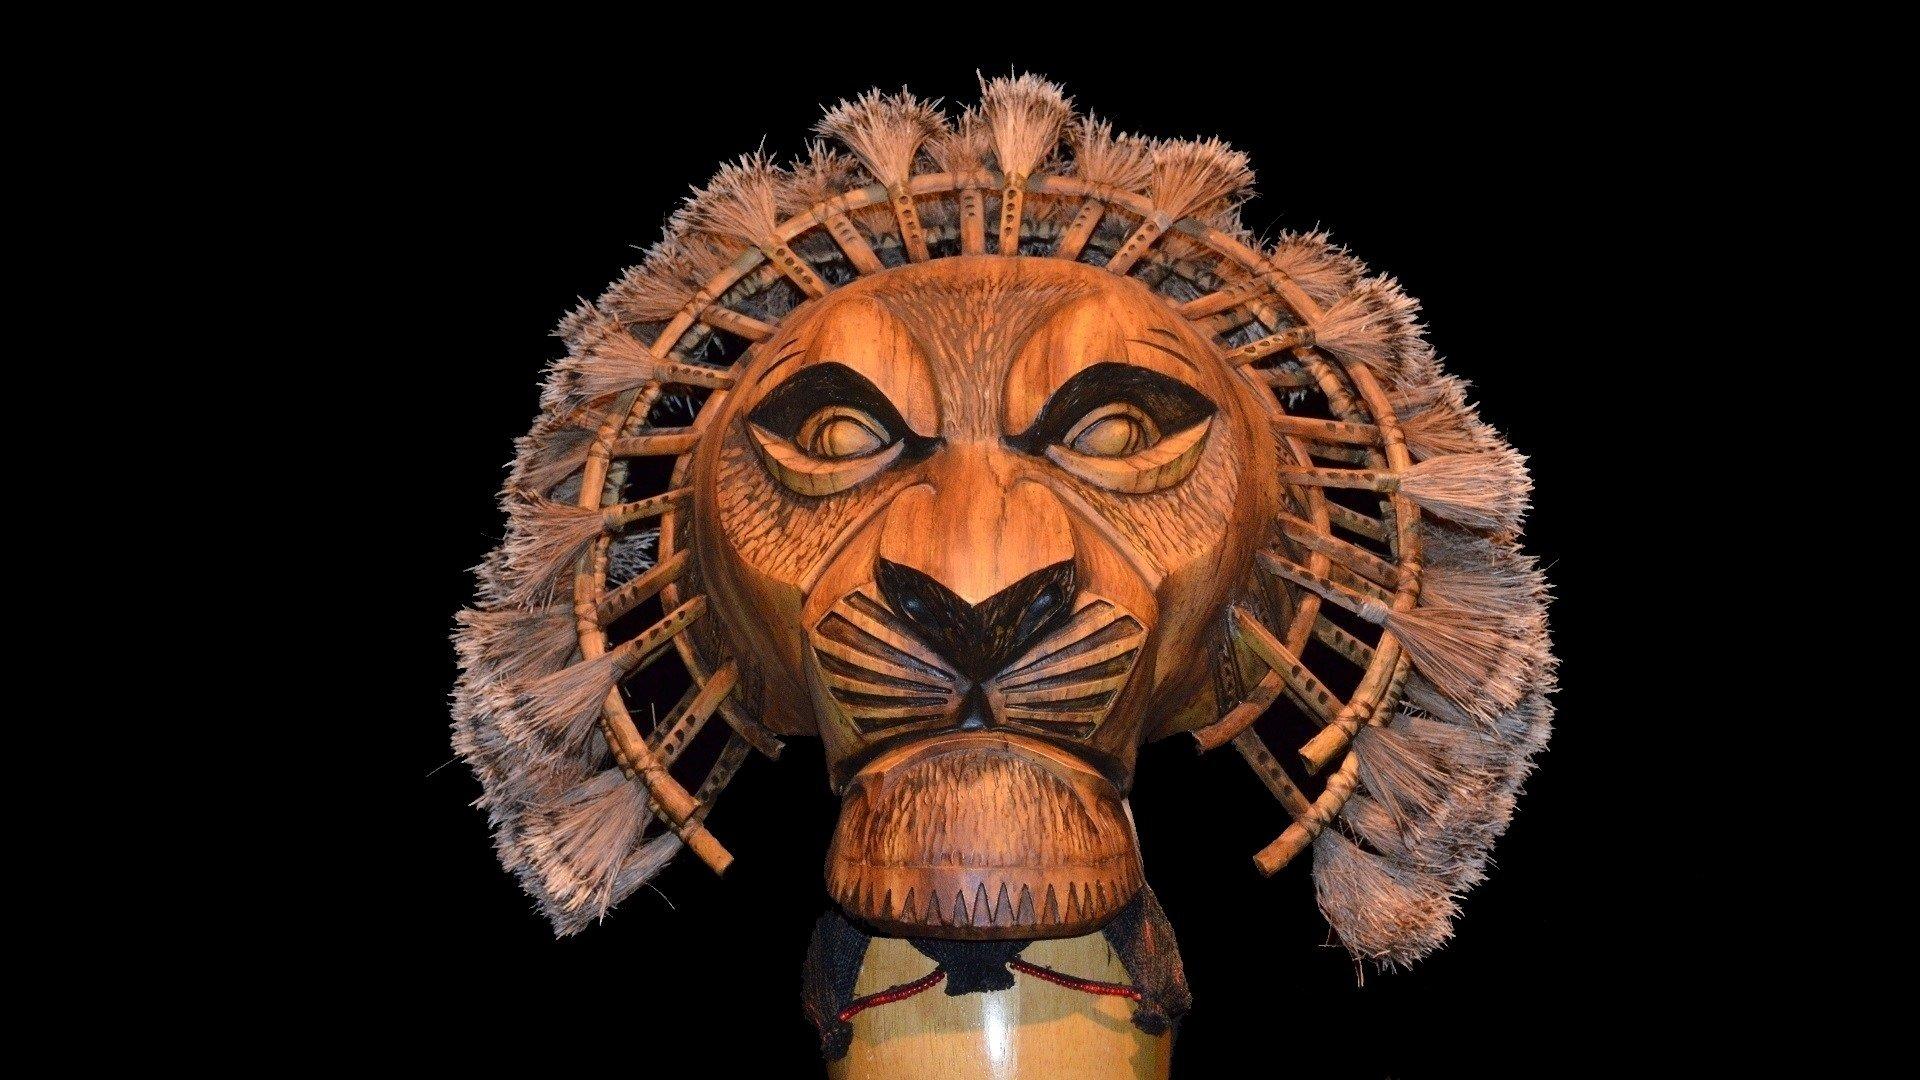 The lion king musical mufasa